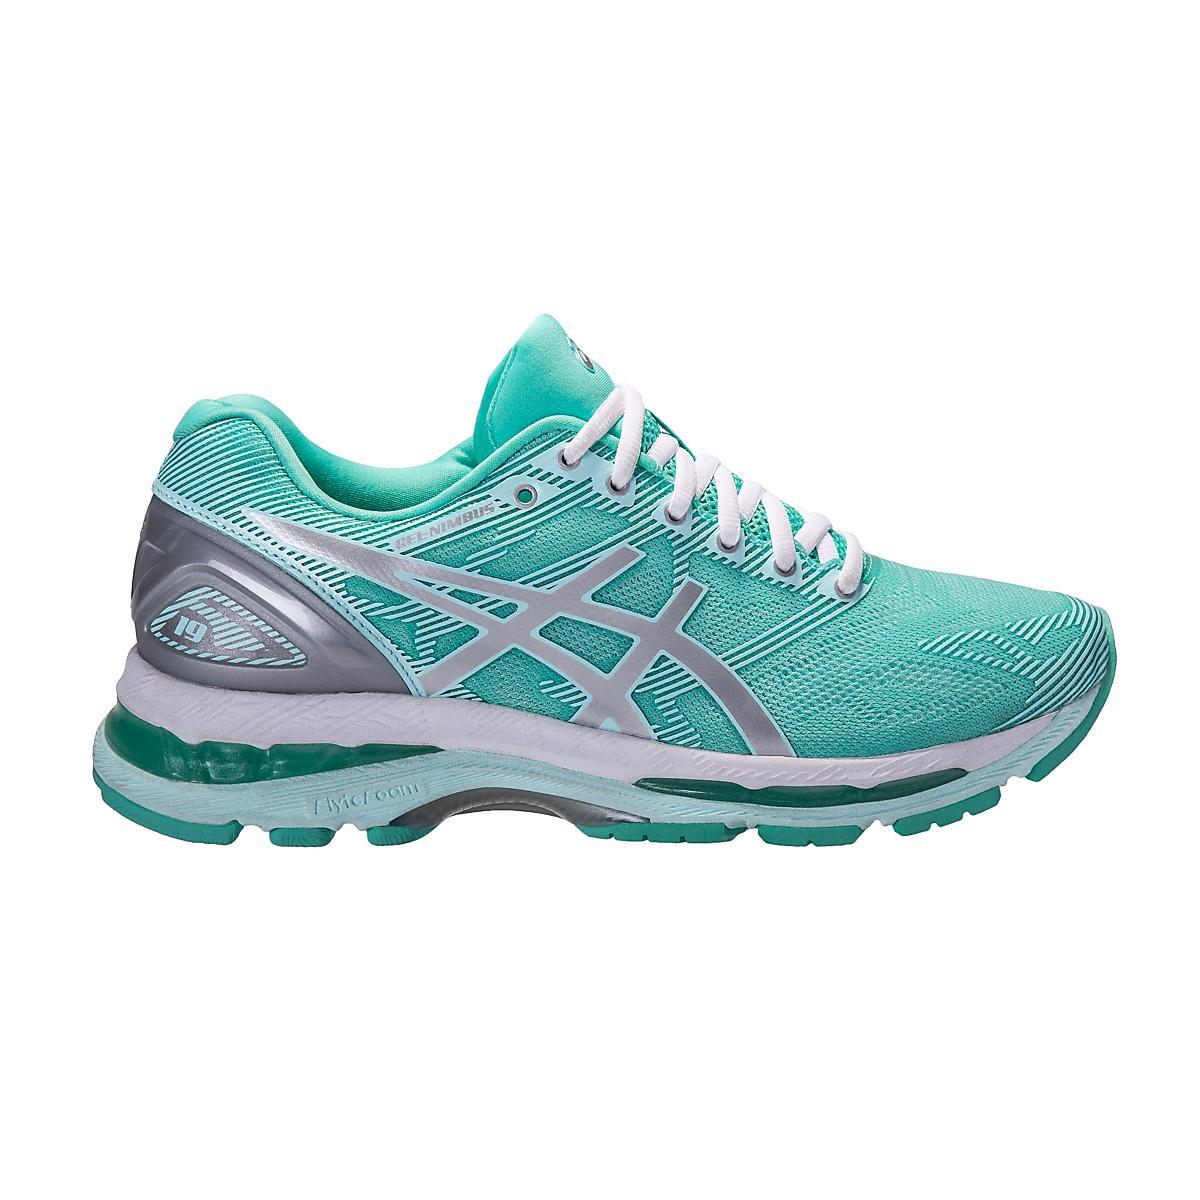 Asics Ladies Road Running Shoes